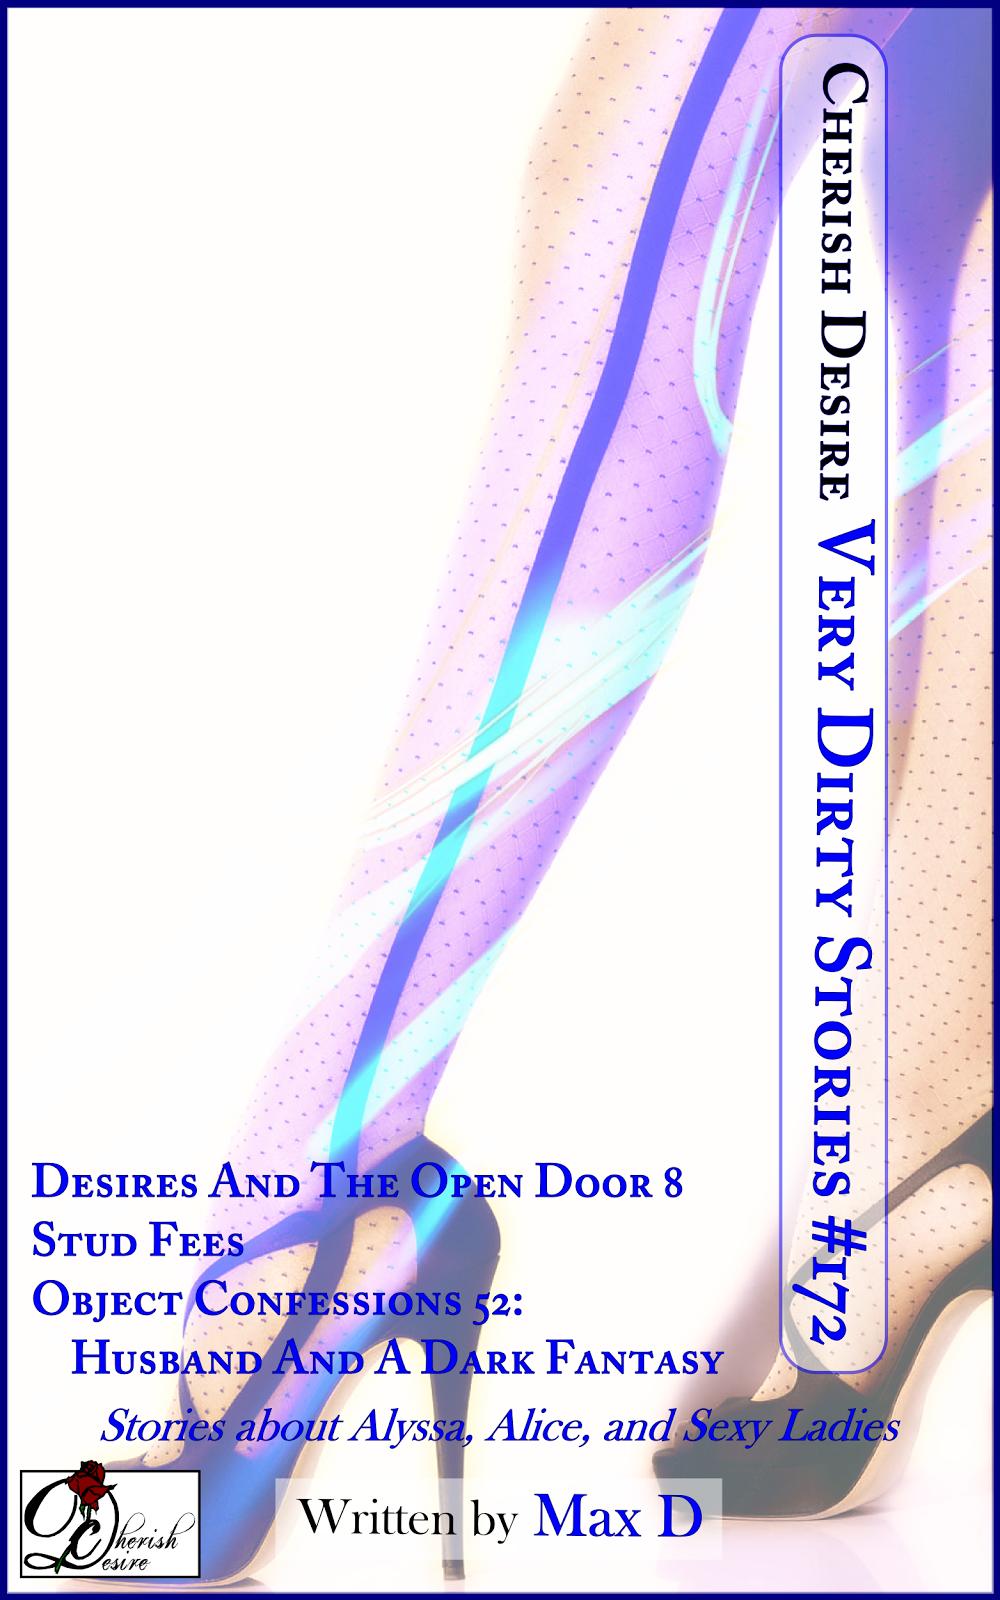 Cherish Desire: Very Dirty Stories #172, Max D, erotica